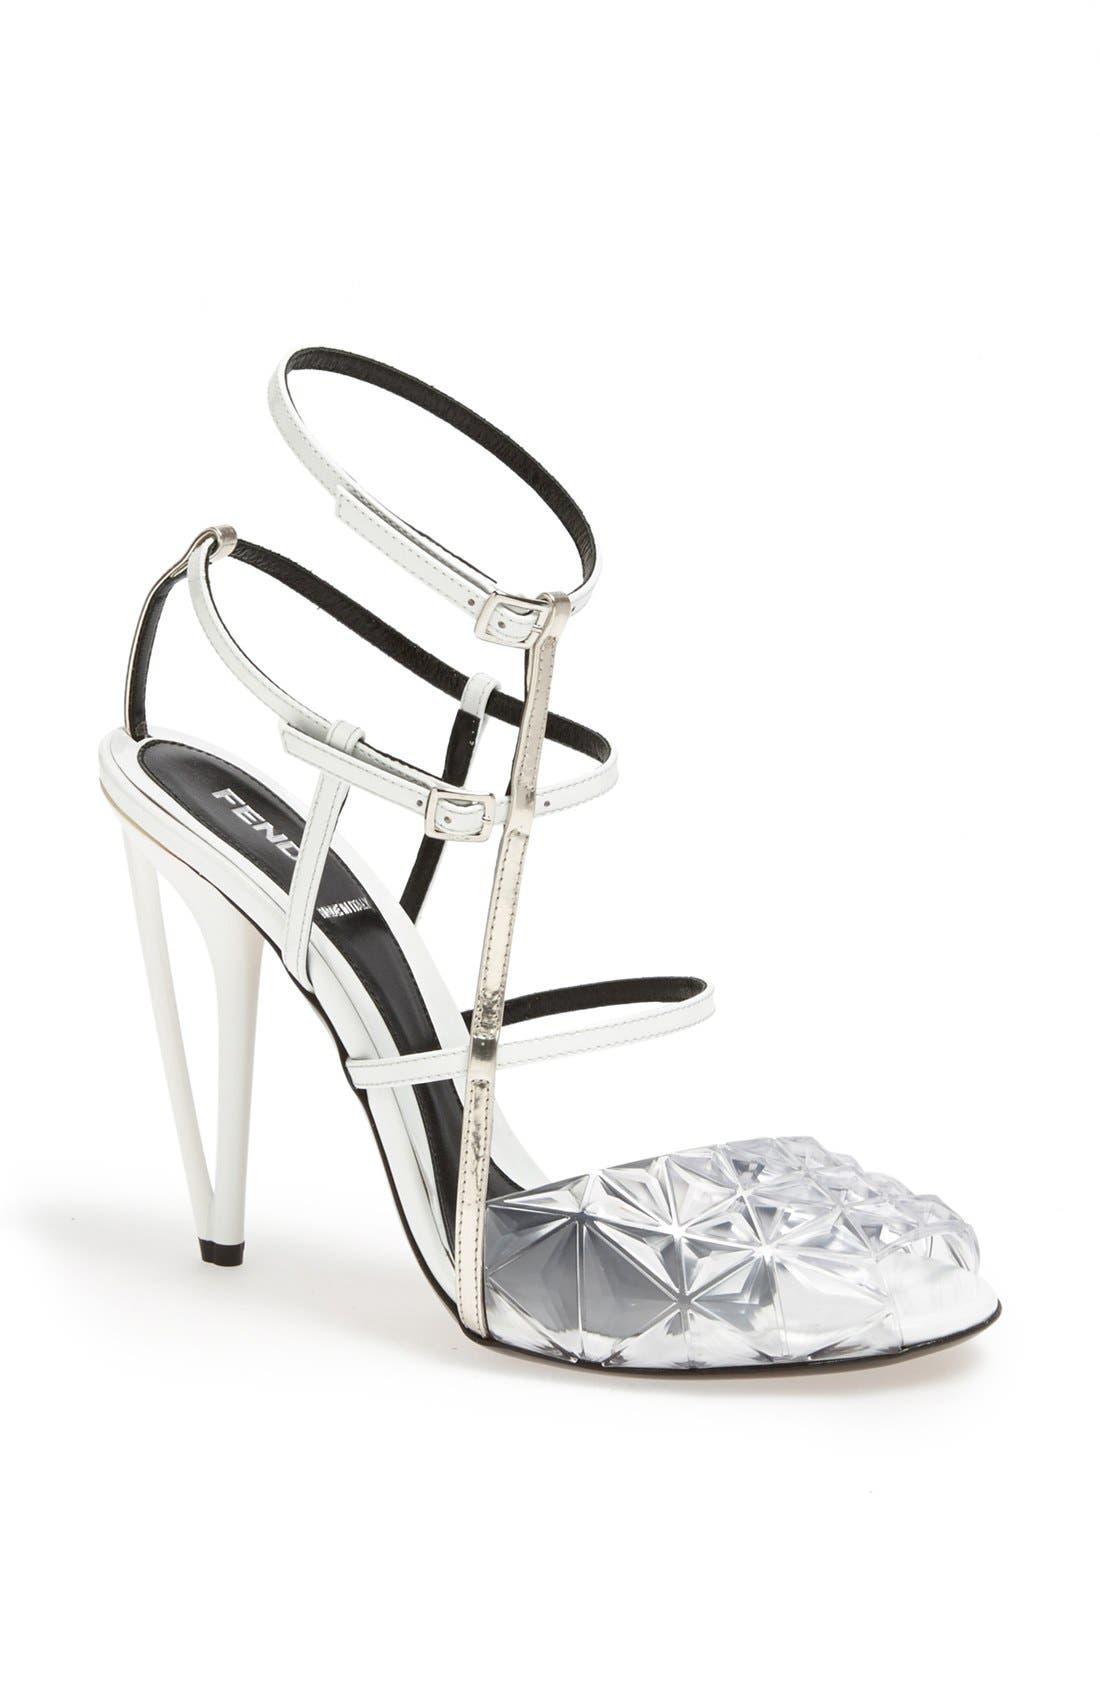 Main Image - Fendi 'Iridia' Sandal